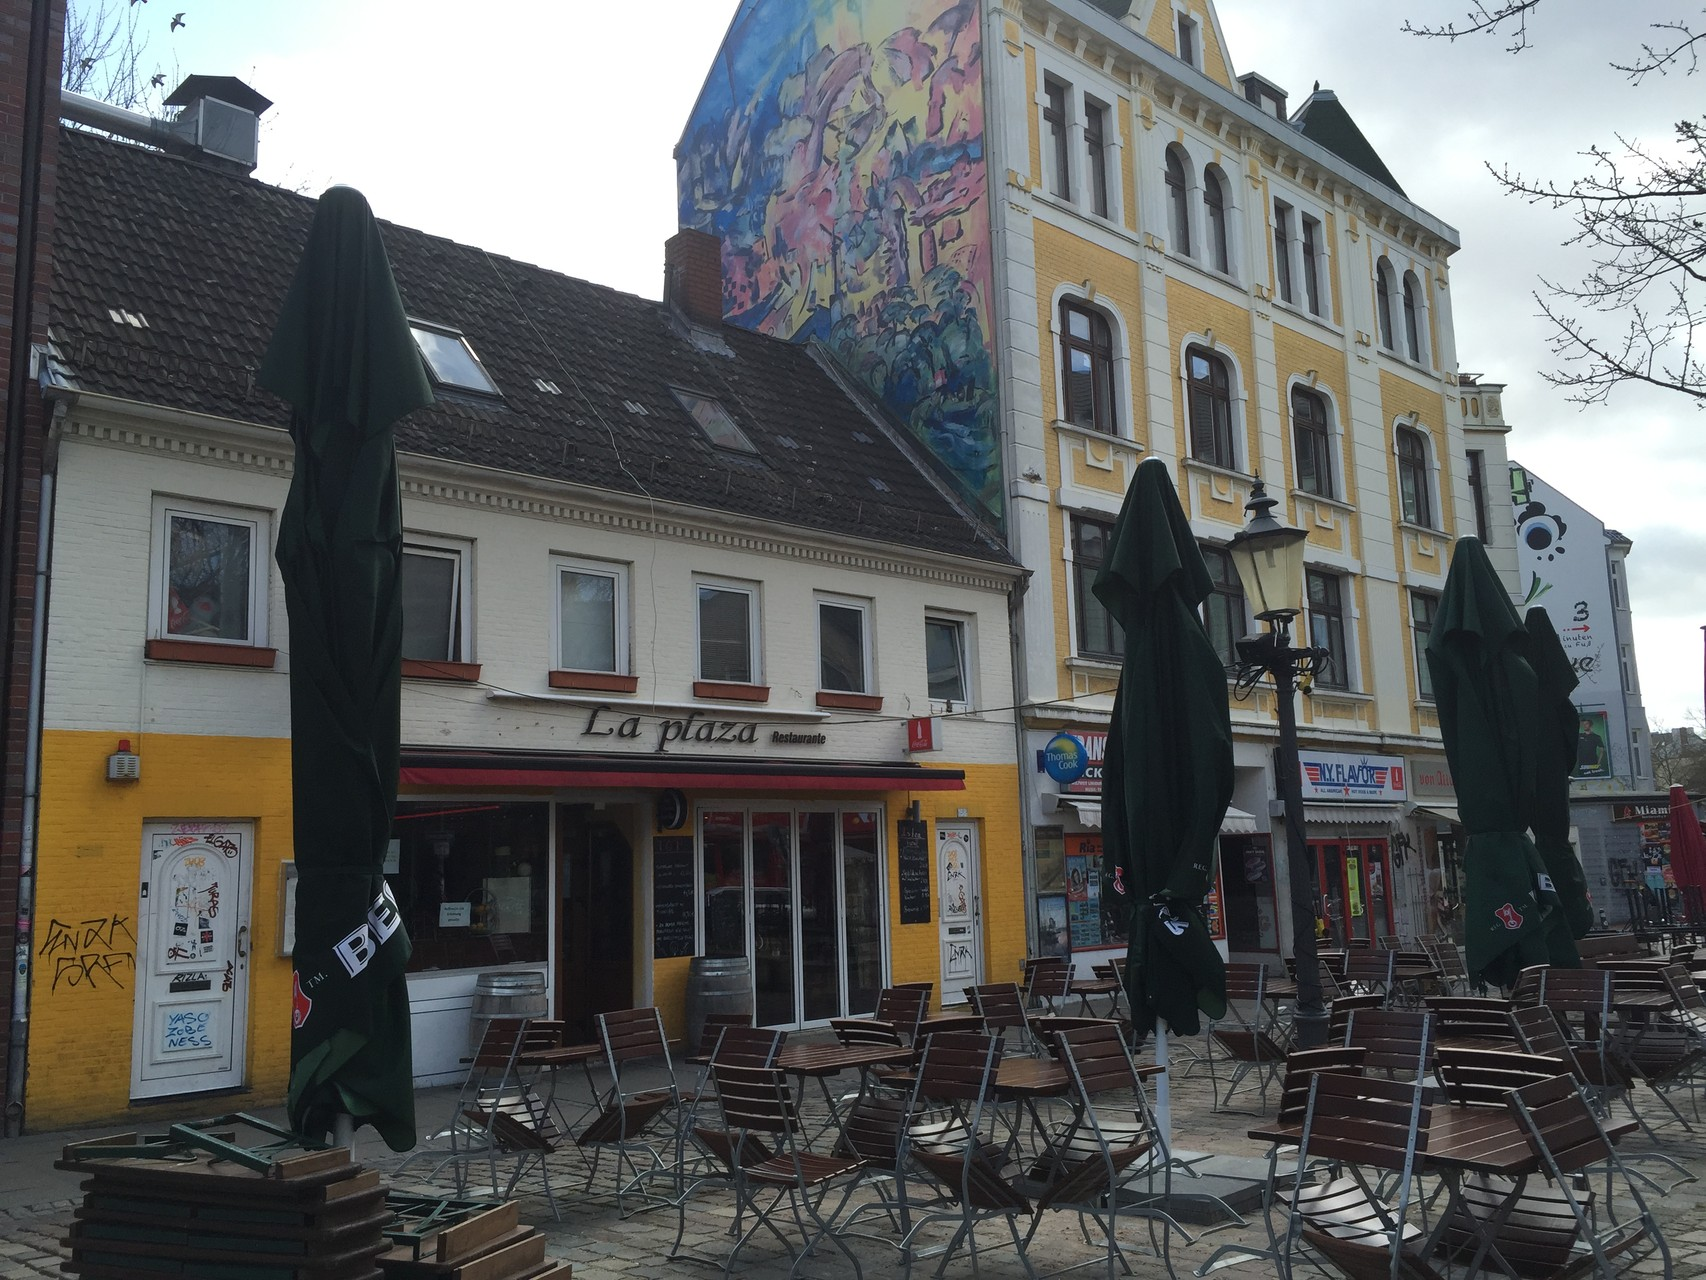 Allma-Wartenberg-Platz